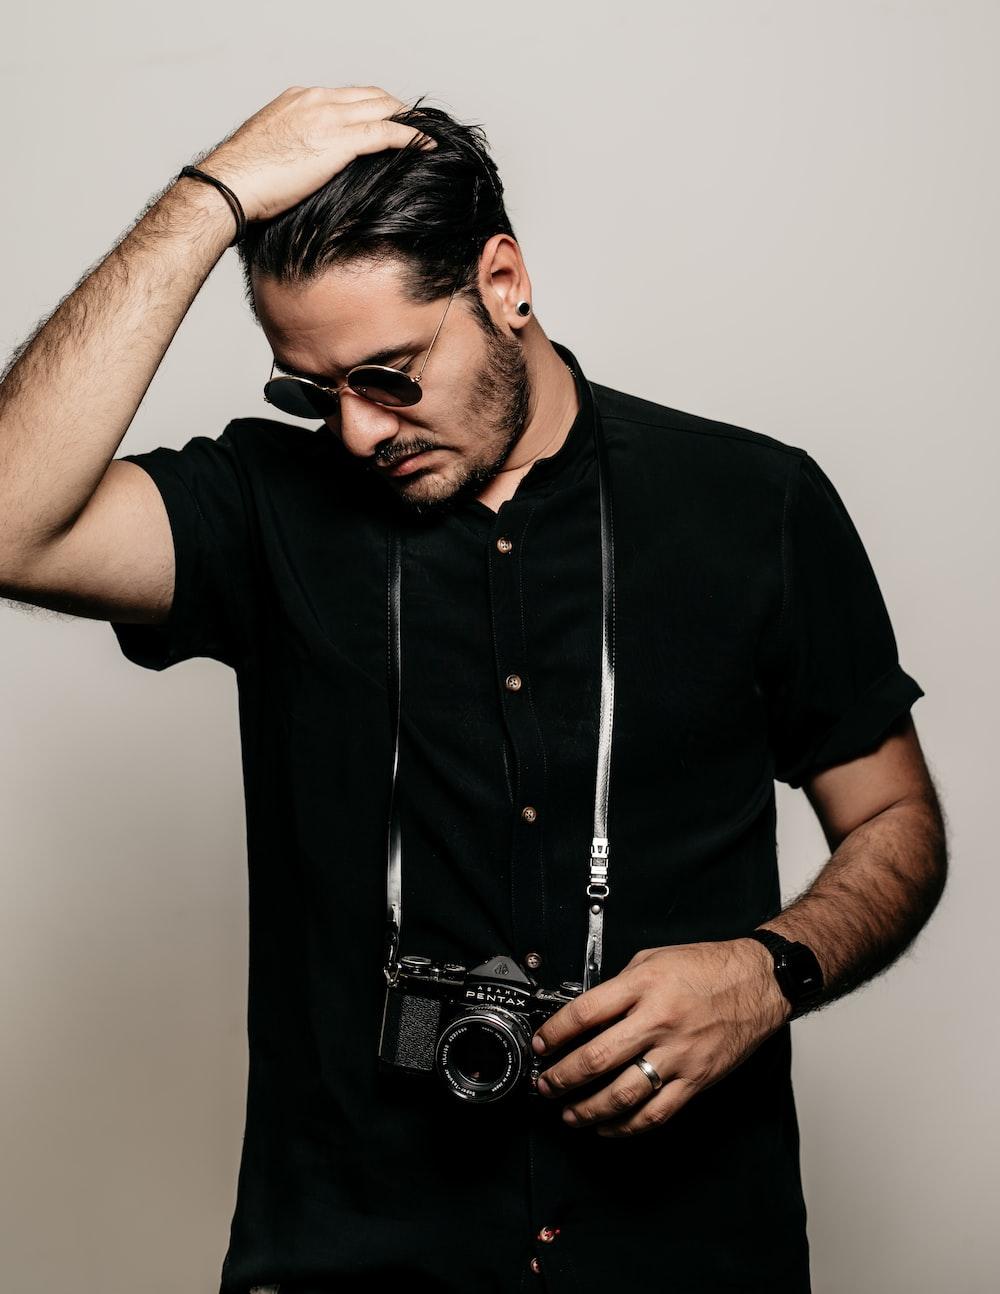 man in black button up shirt holding black dslr camera